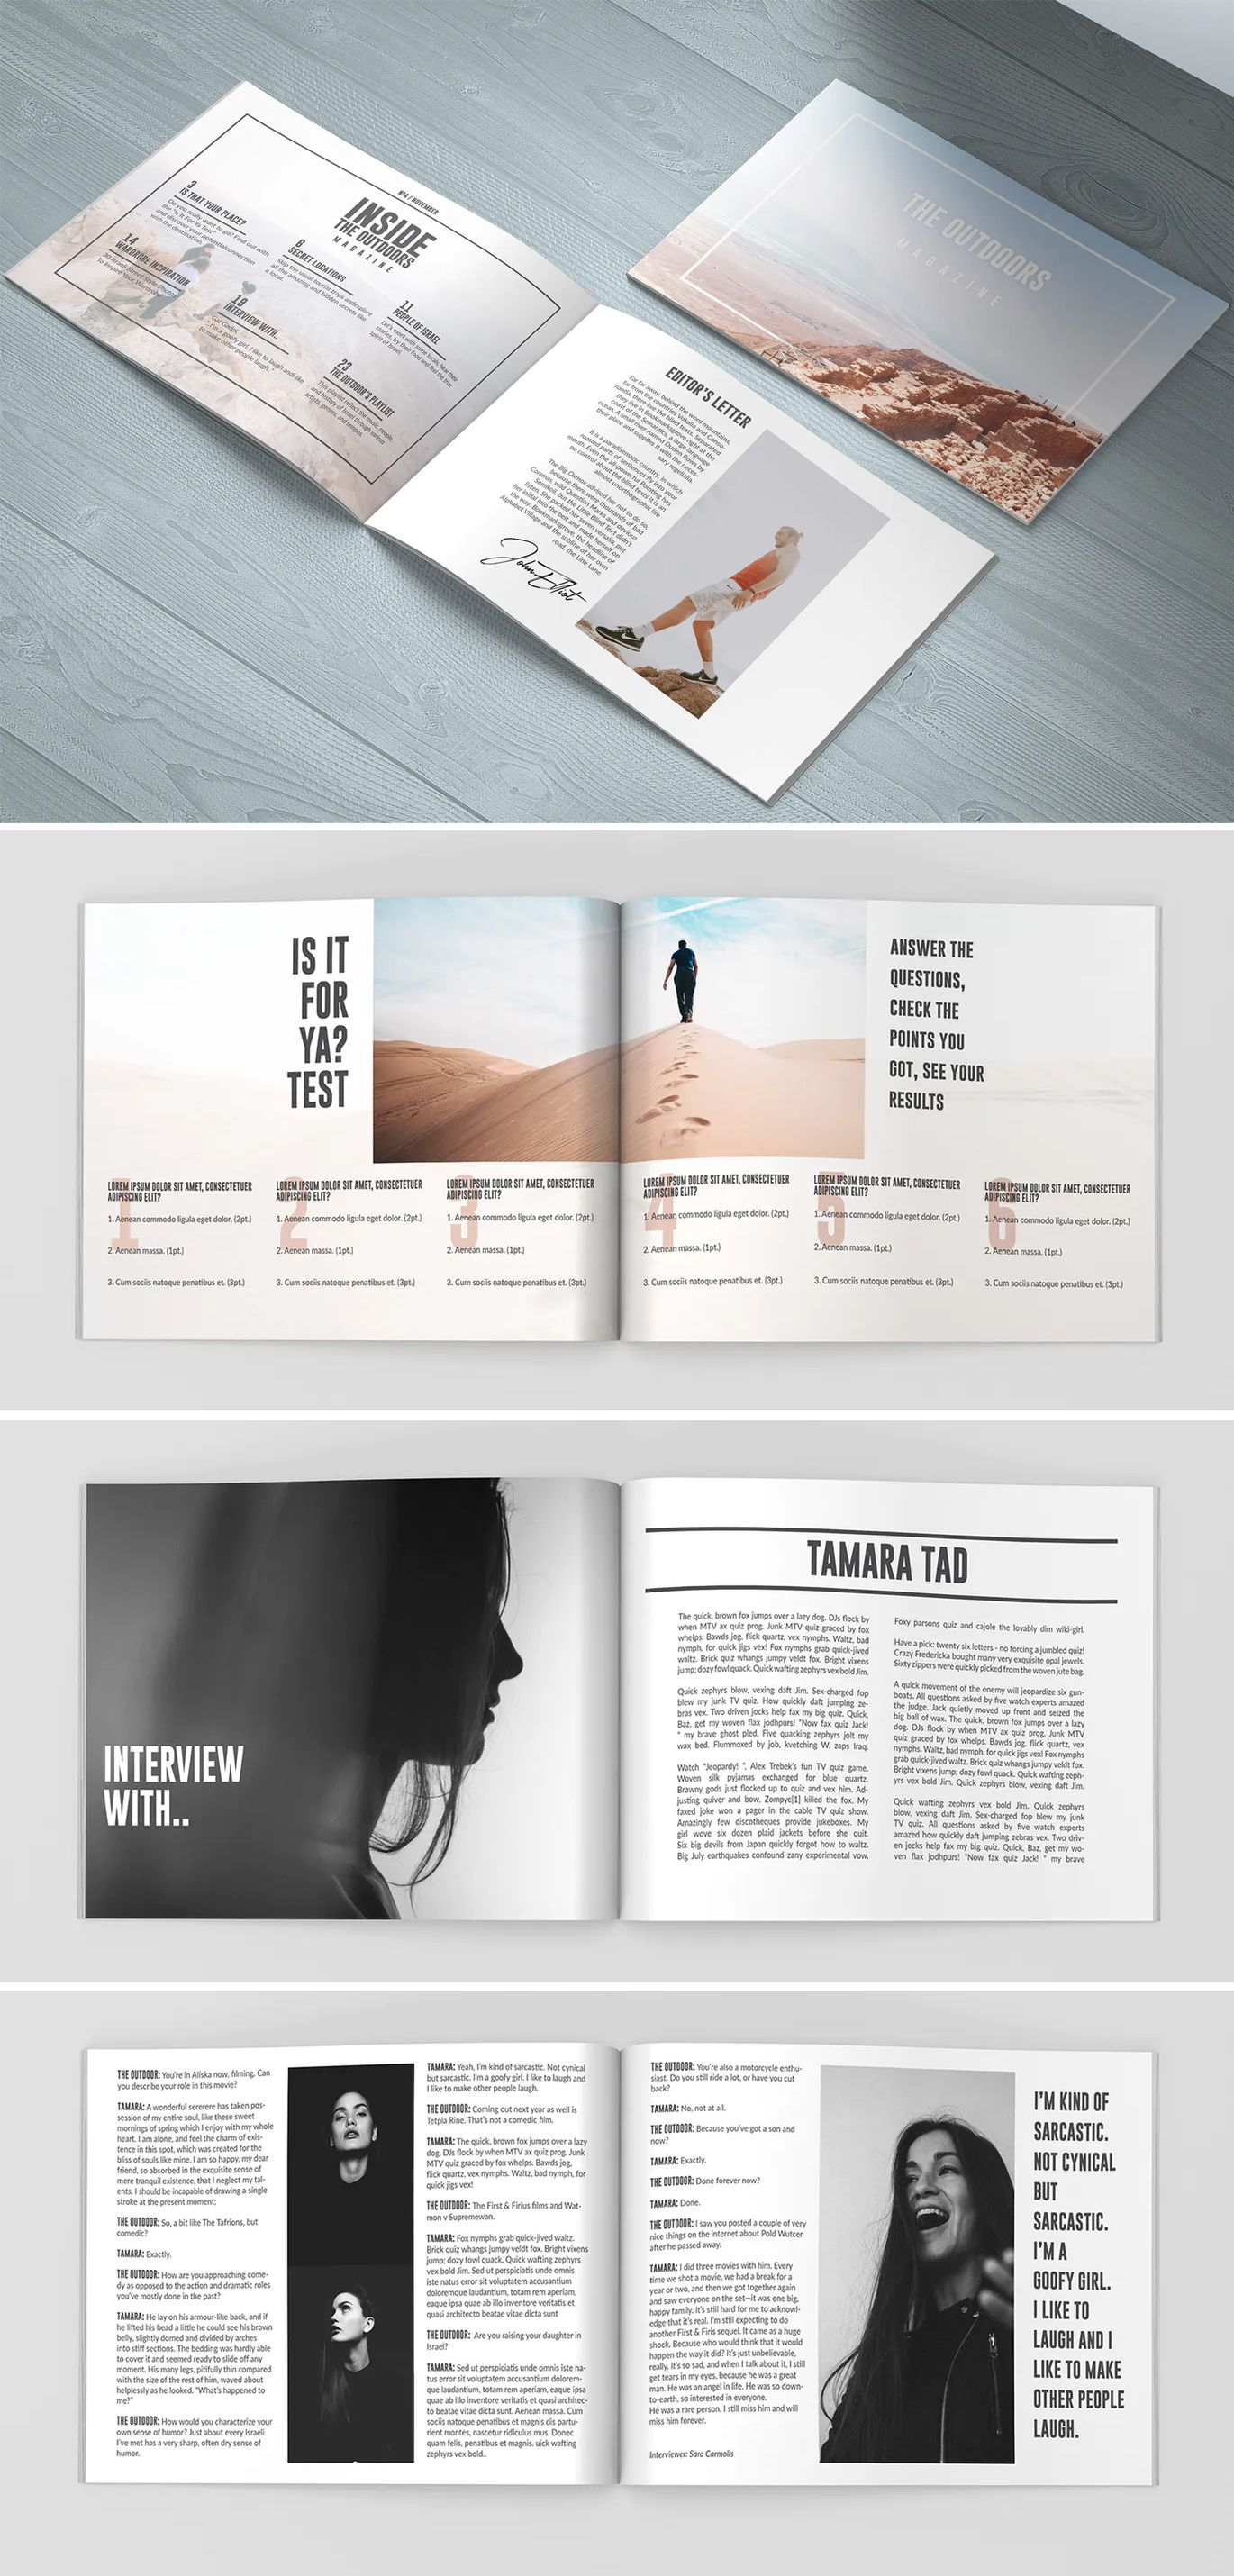 Travel Magazine Landscape Layout In 2020 Travel Magazine Layout Magazine Layout Design Indesign Layout